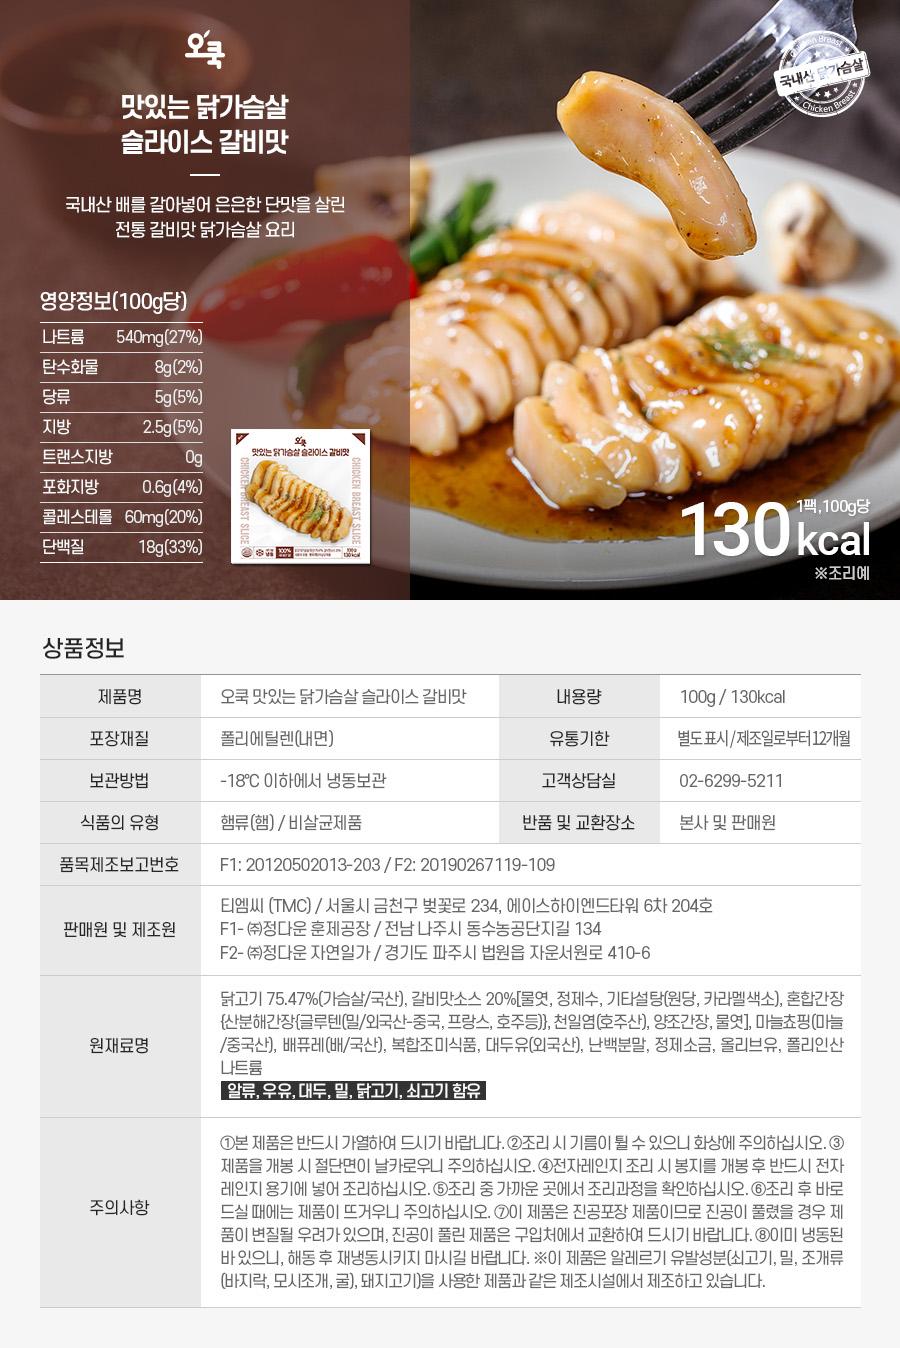 detail_slice_galbi.jpg